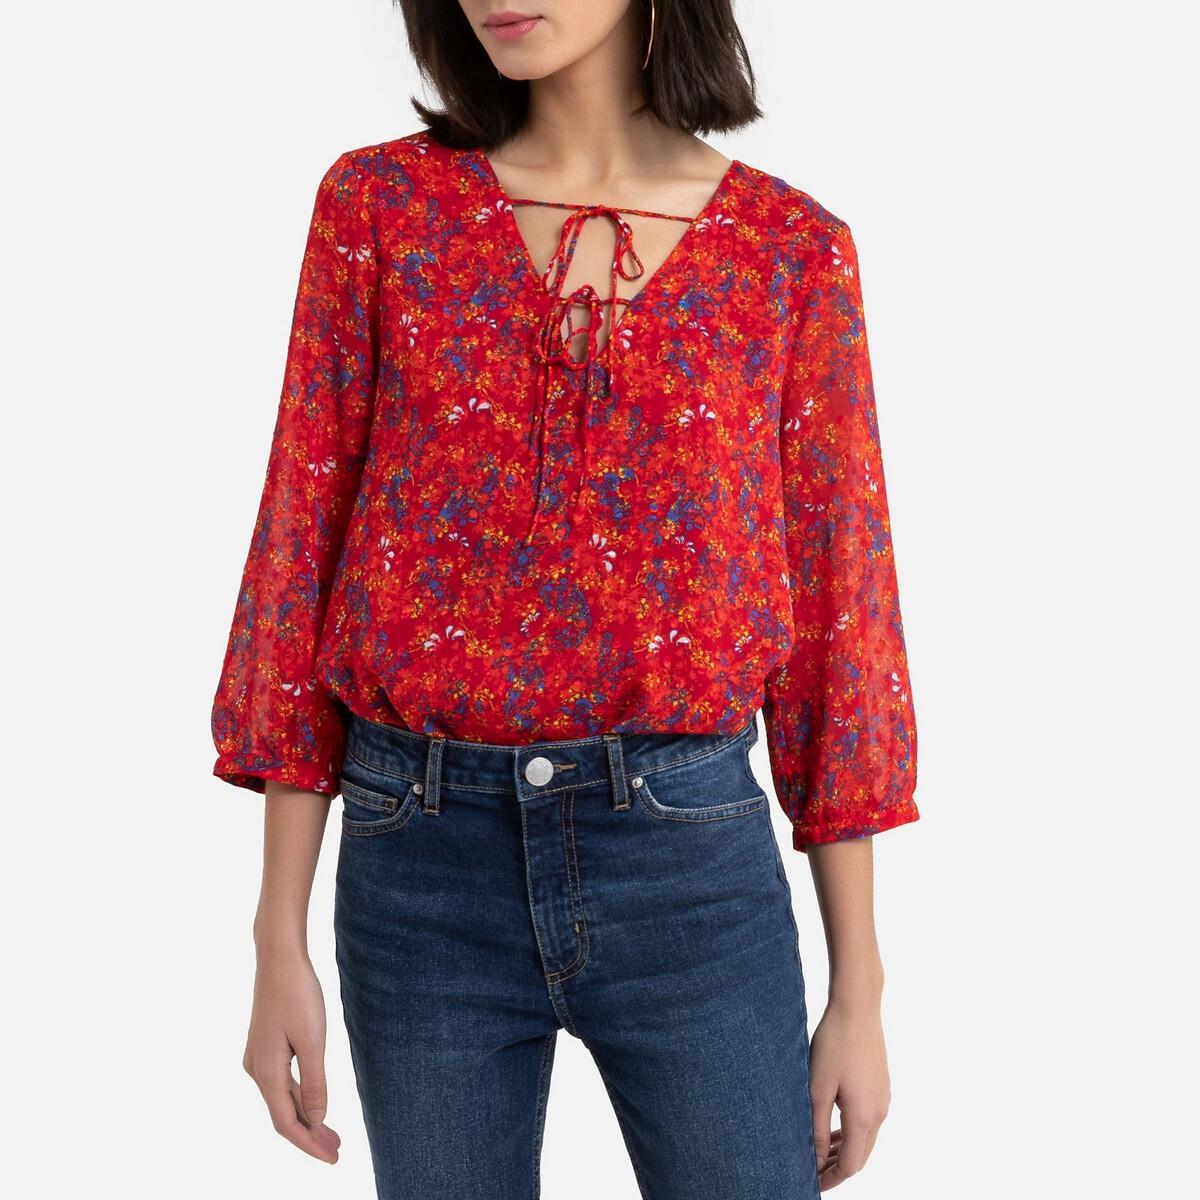 Блузка La Redoute С рисунком и рукавами 34 (FR) - 40 (RUS) розовый блузка с рисунком и рукавами с напуском kalao blouse